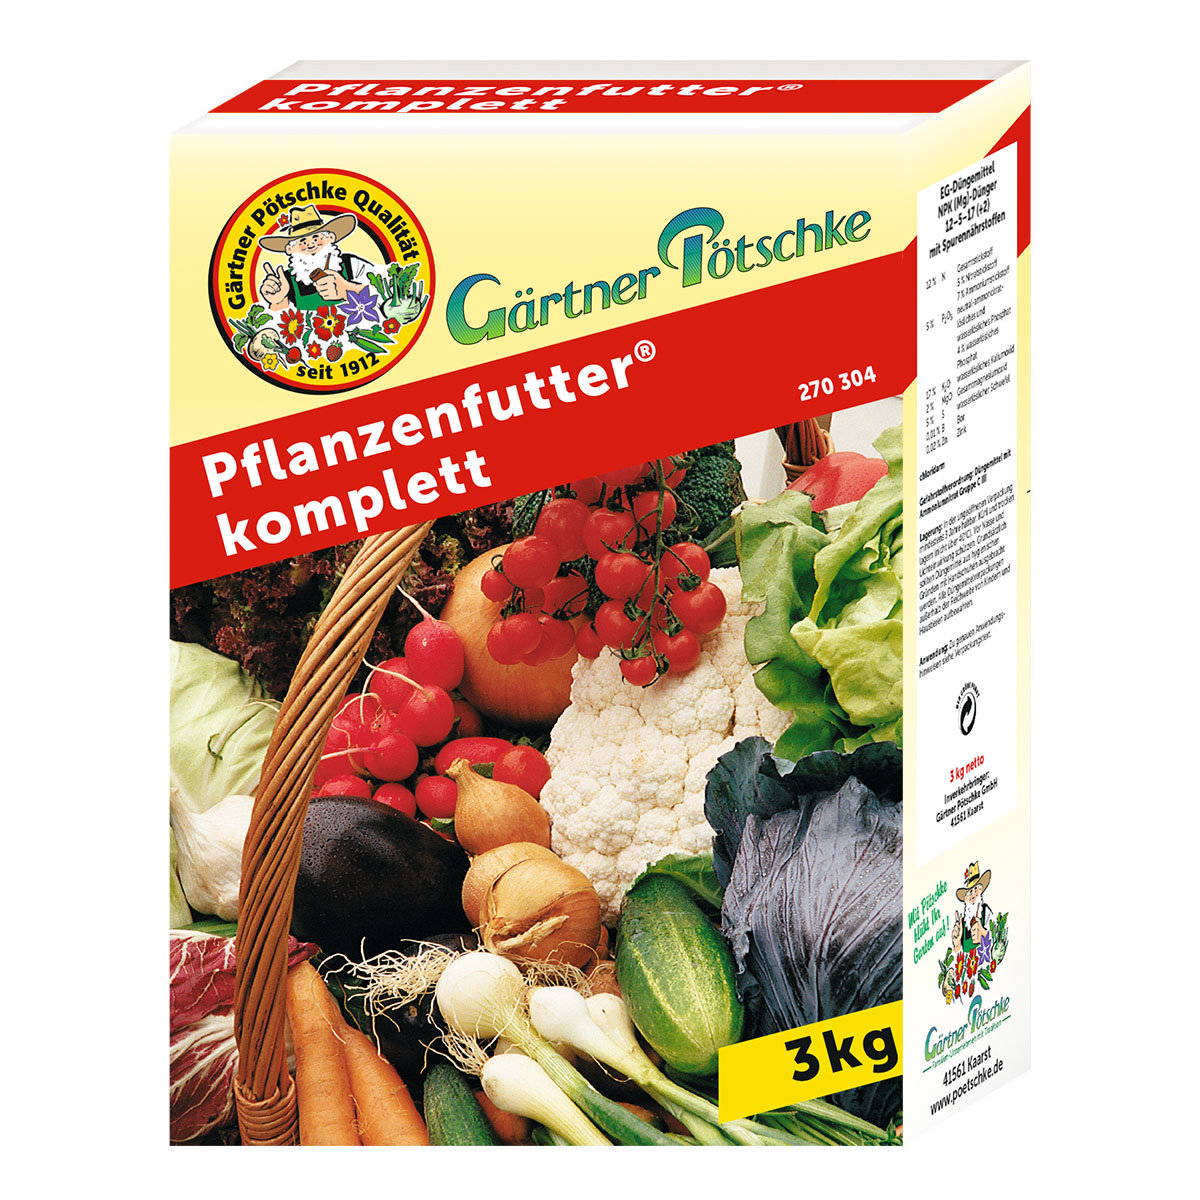 Gärtner Pötschke Pflanzenfutter komplett, 3 kg